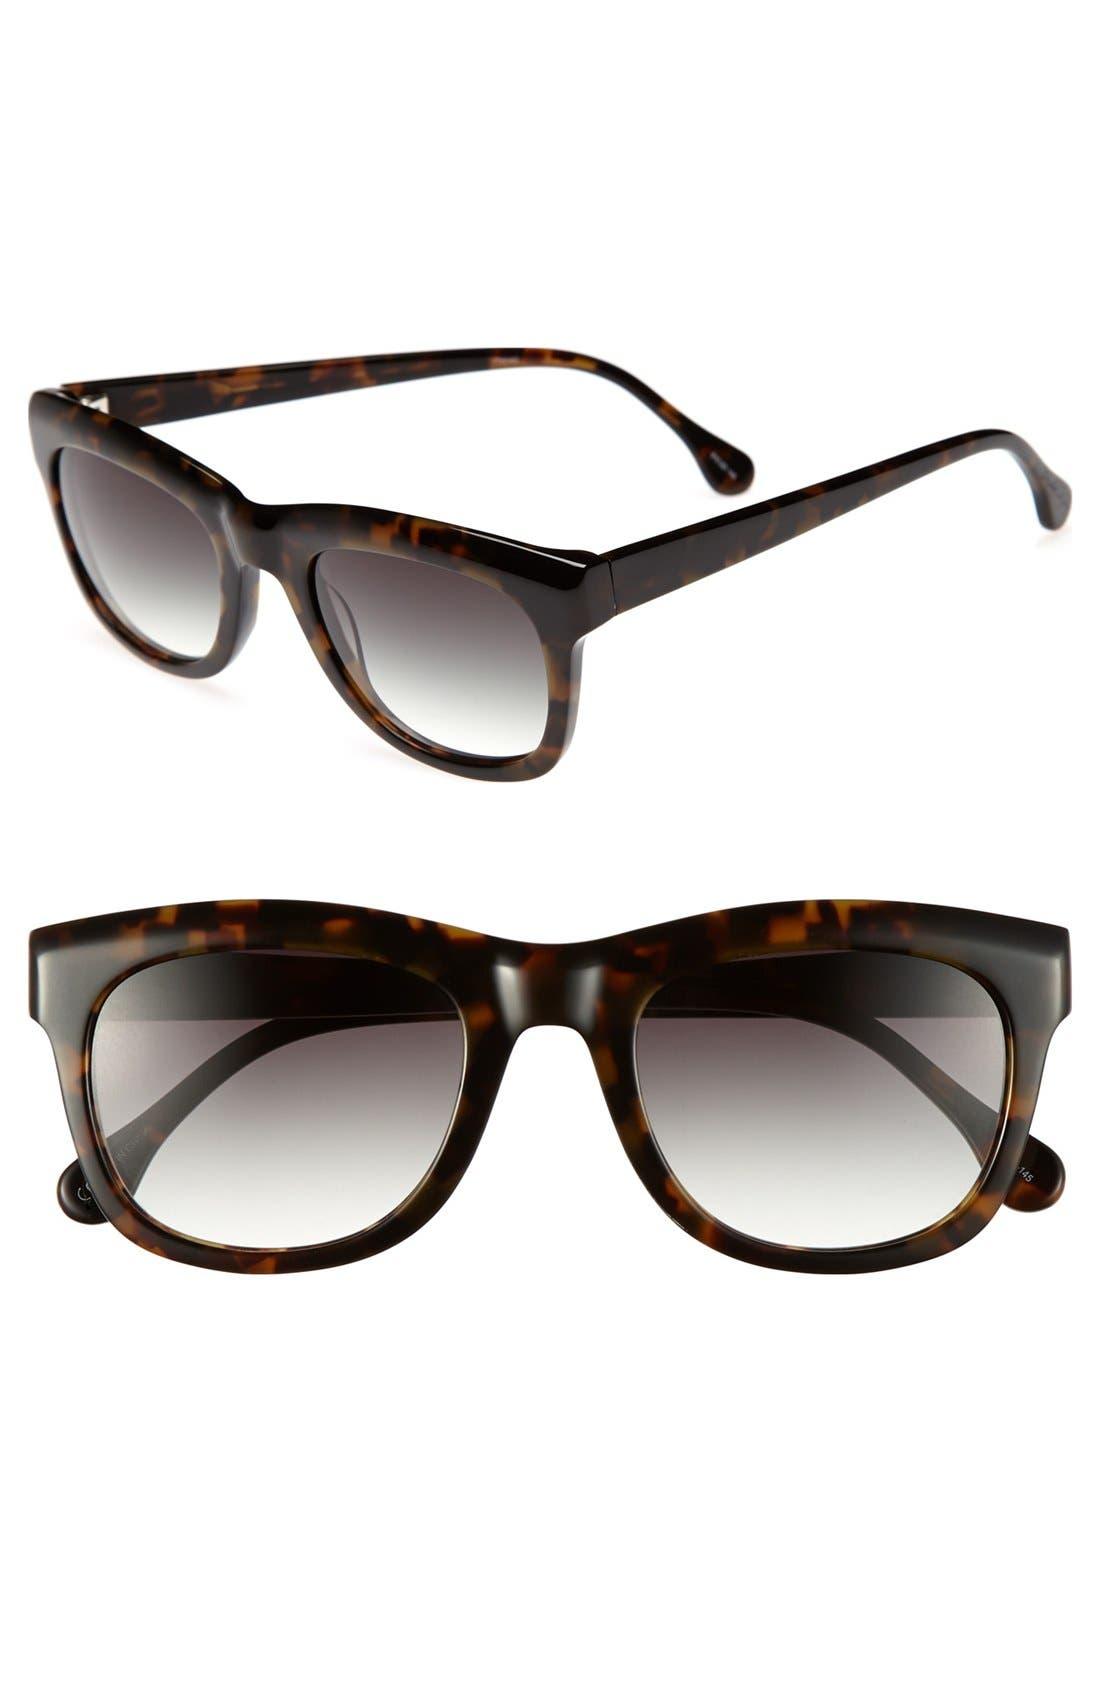 Alternate Image 1 Selected - Elizabeth and James 'Harrington' 51mm Sunglasses